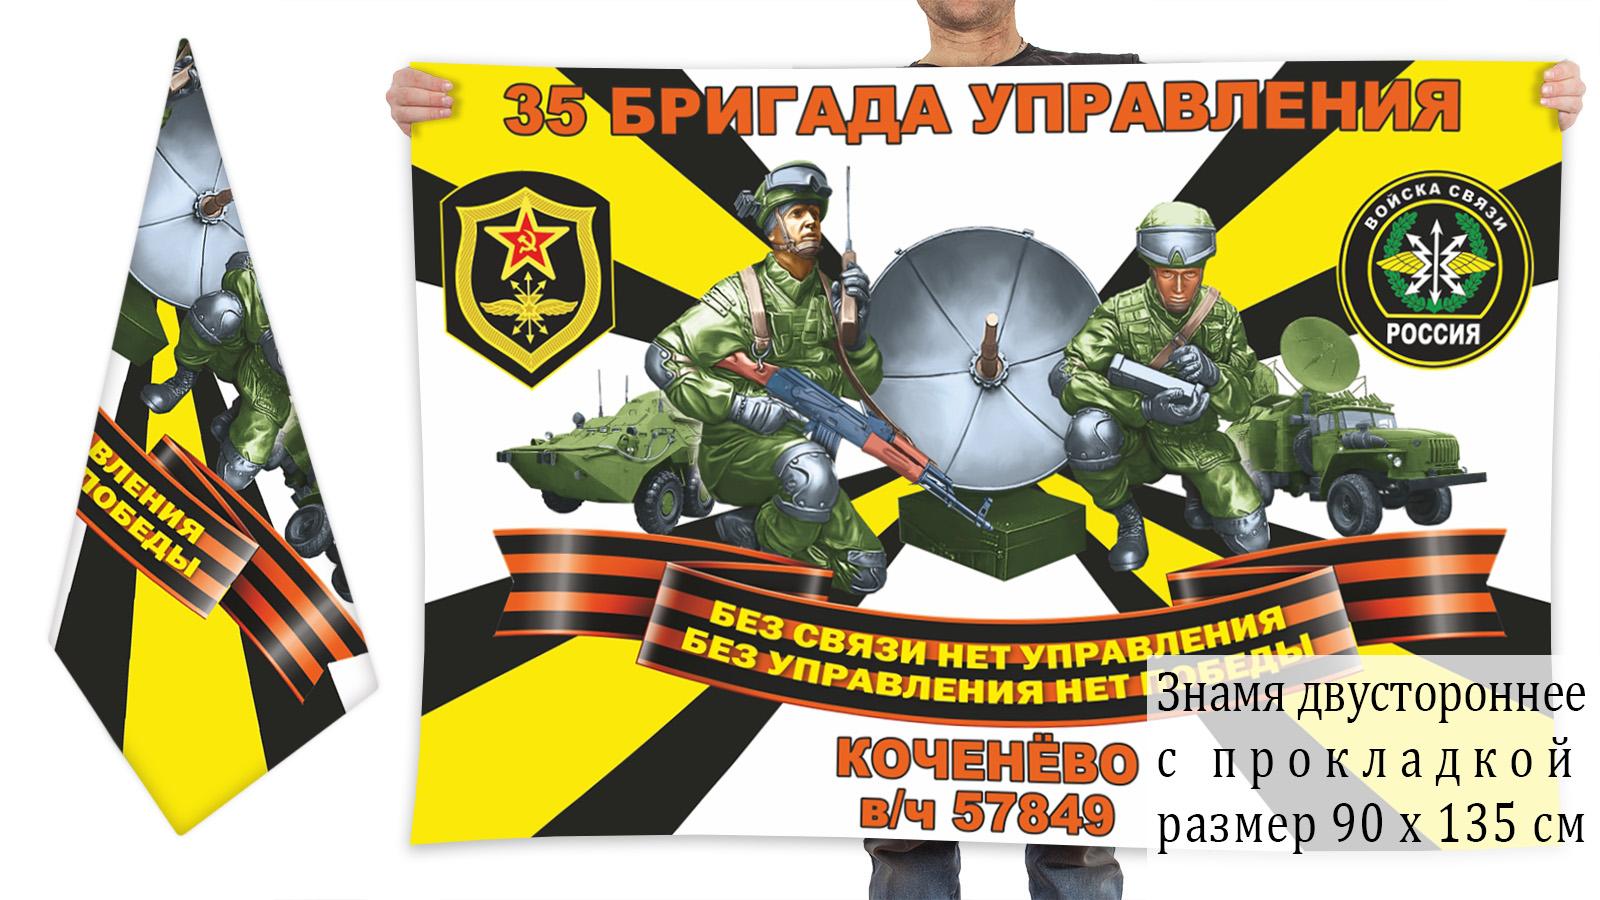 Двусторонний флаг 35 бригада управления войск связи